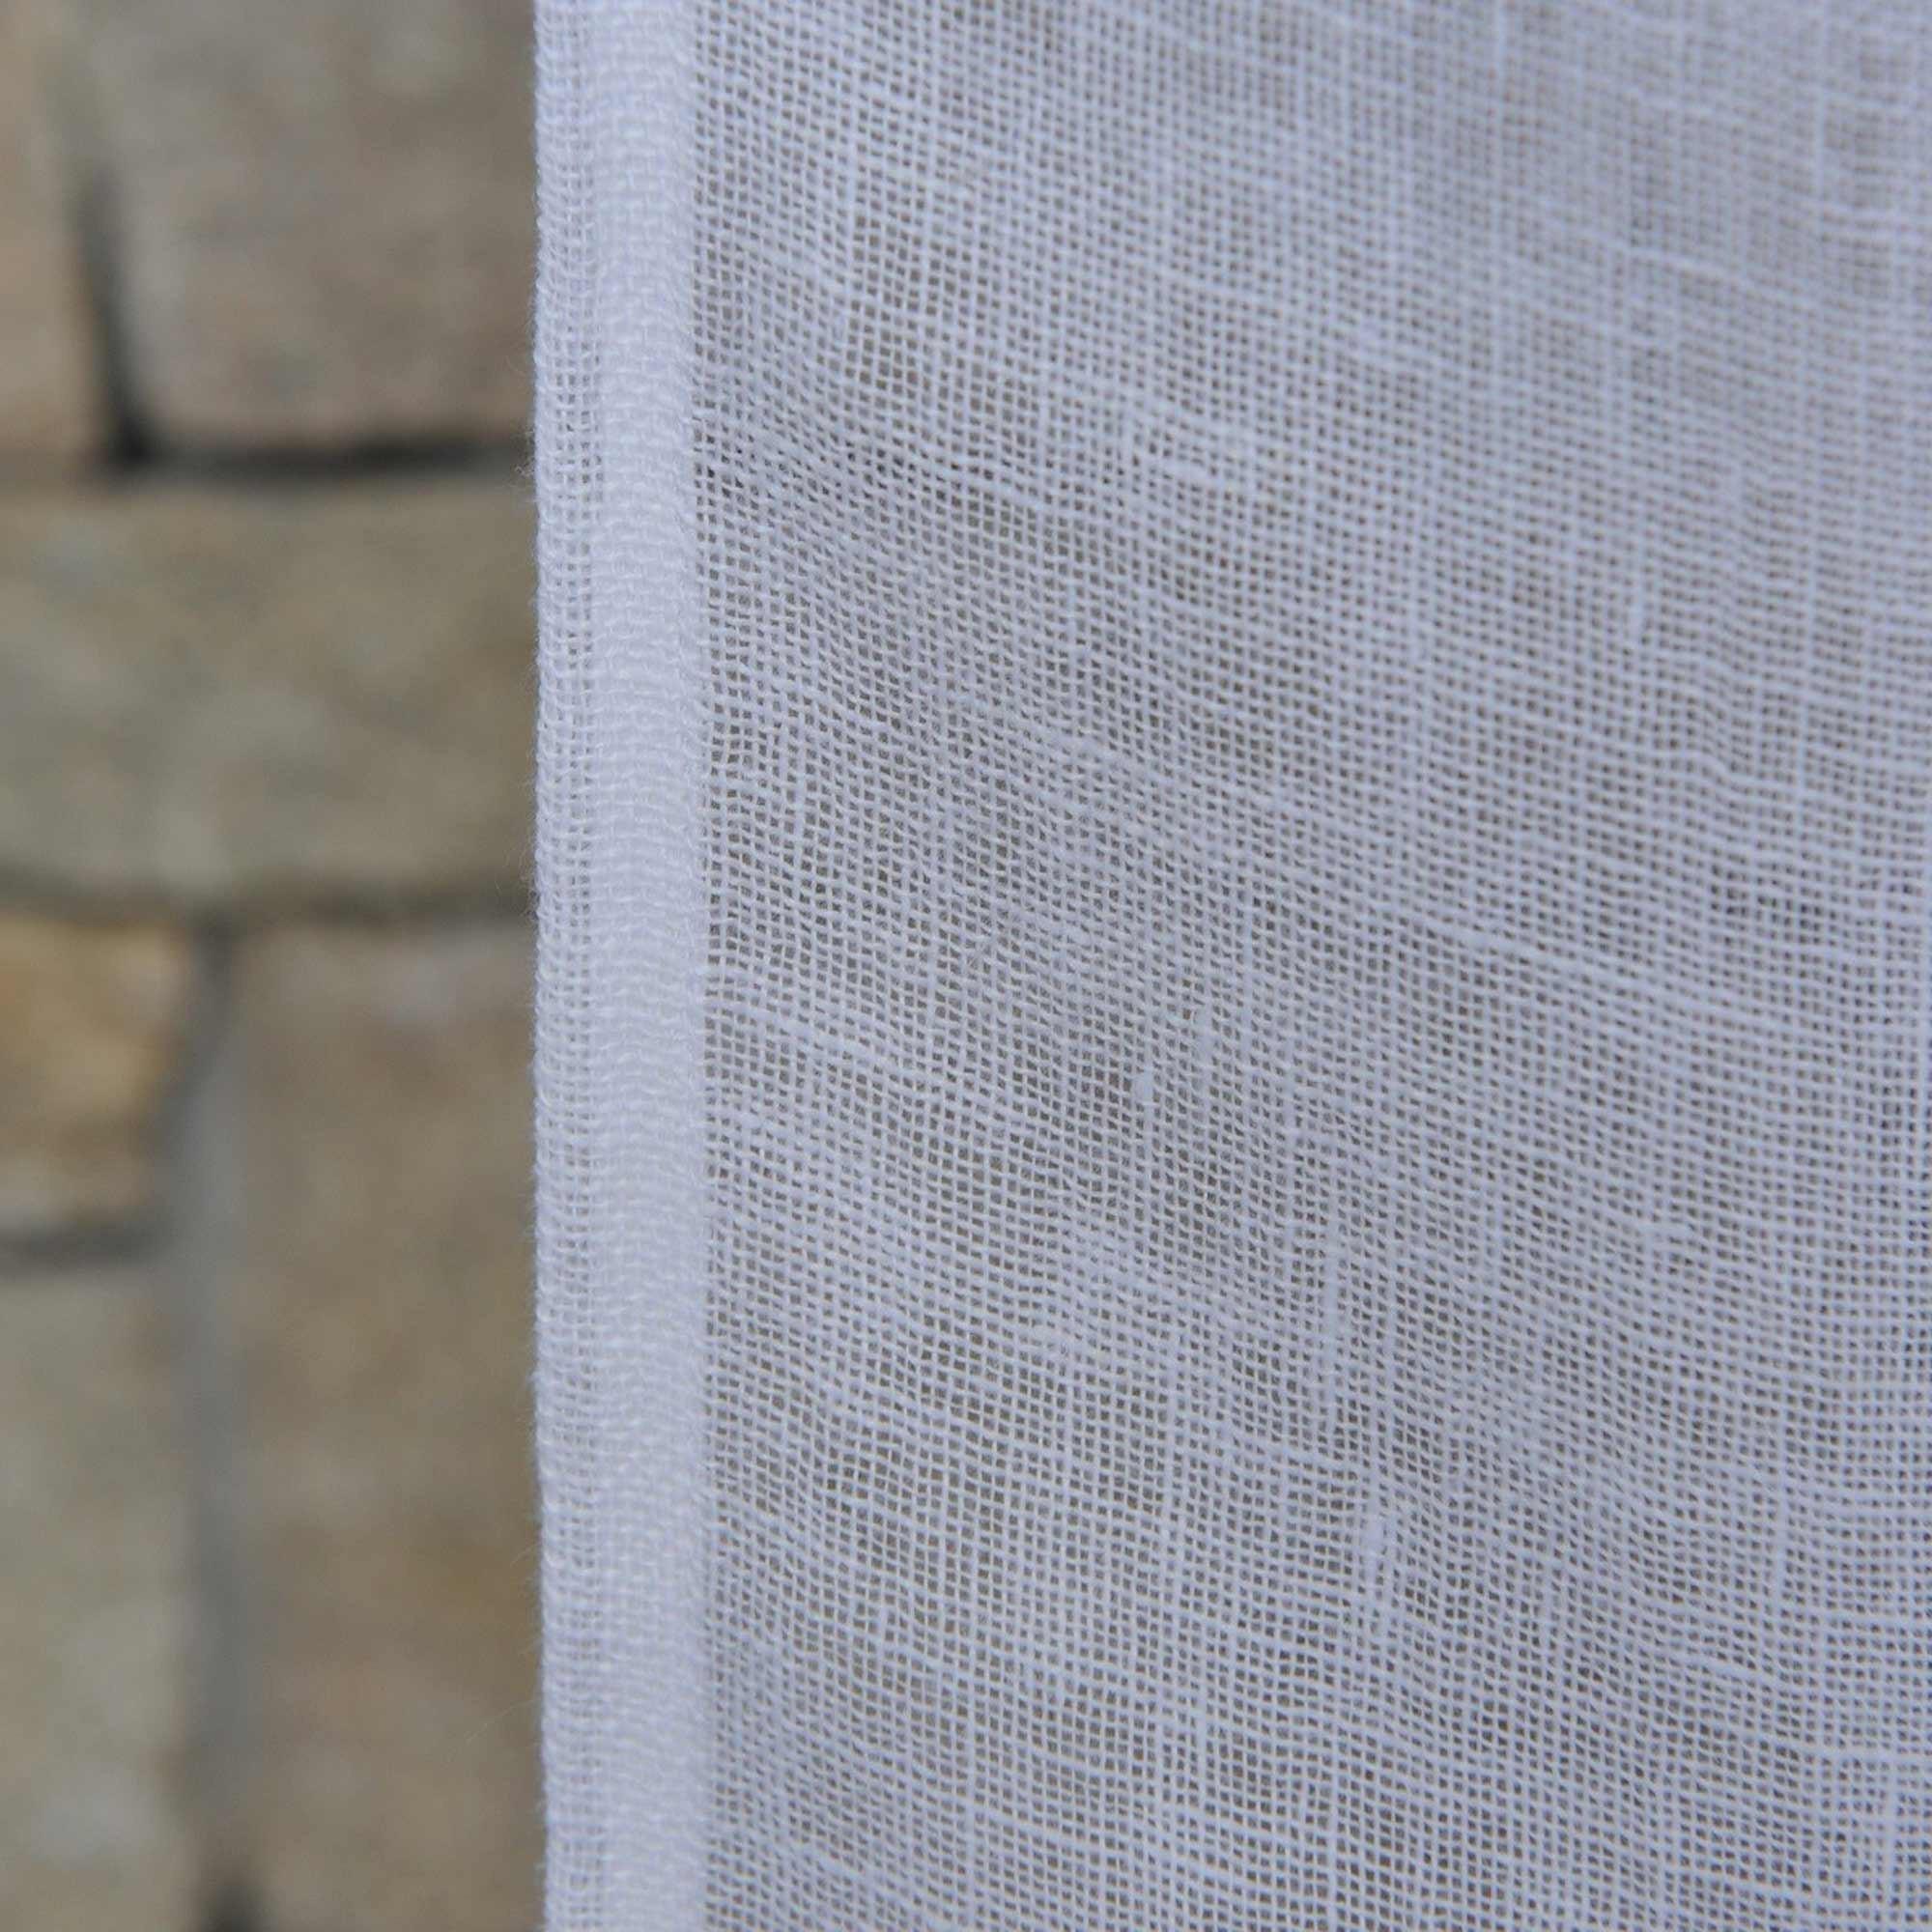 Home > Curtains & Blinds > Curtains > White linen gauze curtain